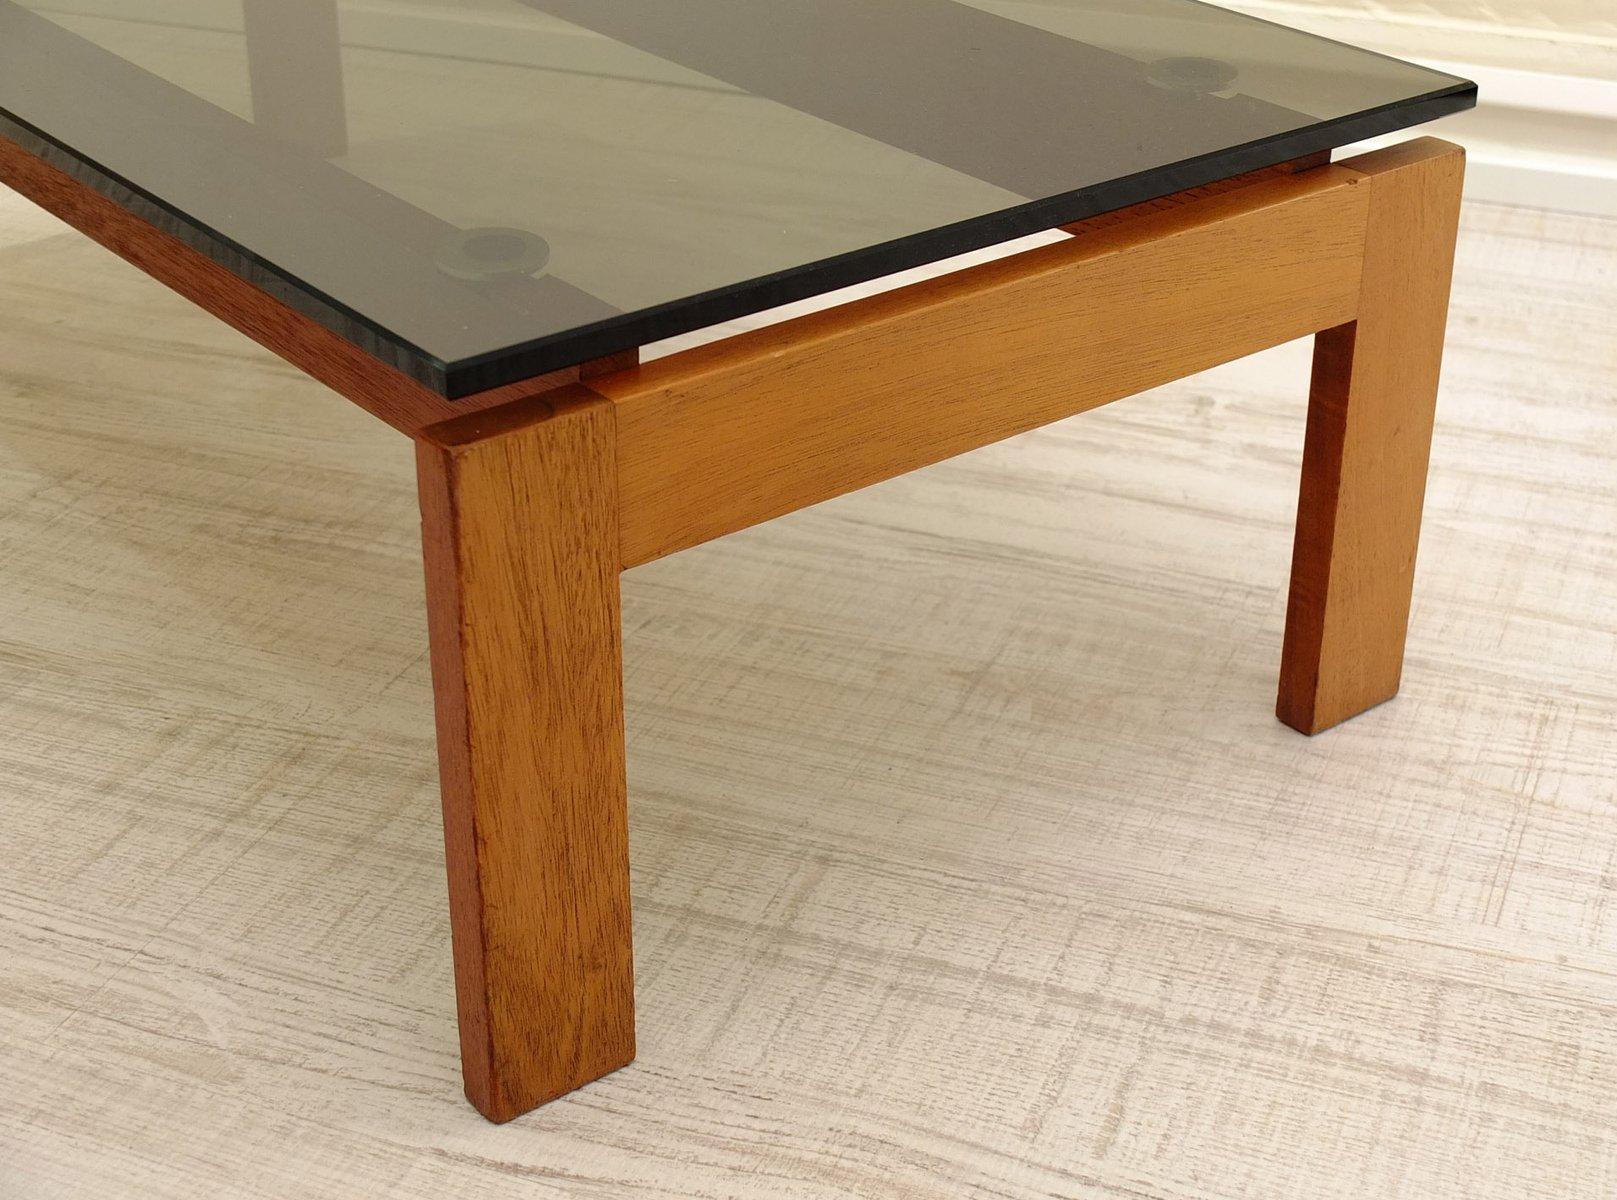 table d 39 appoint en teck et en verre fum danemark 1970s en vente sur pamono. Black Bedroom Furniture Sets. Home Design Ideas